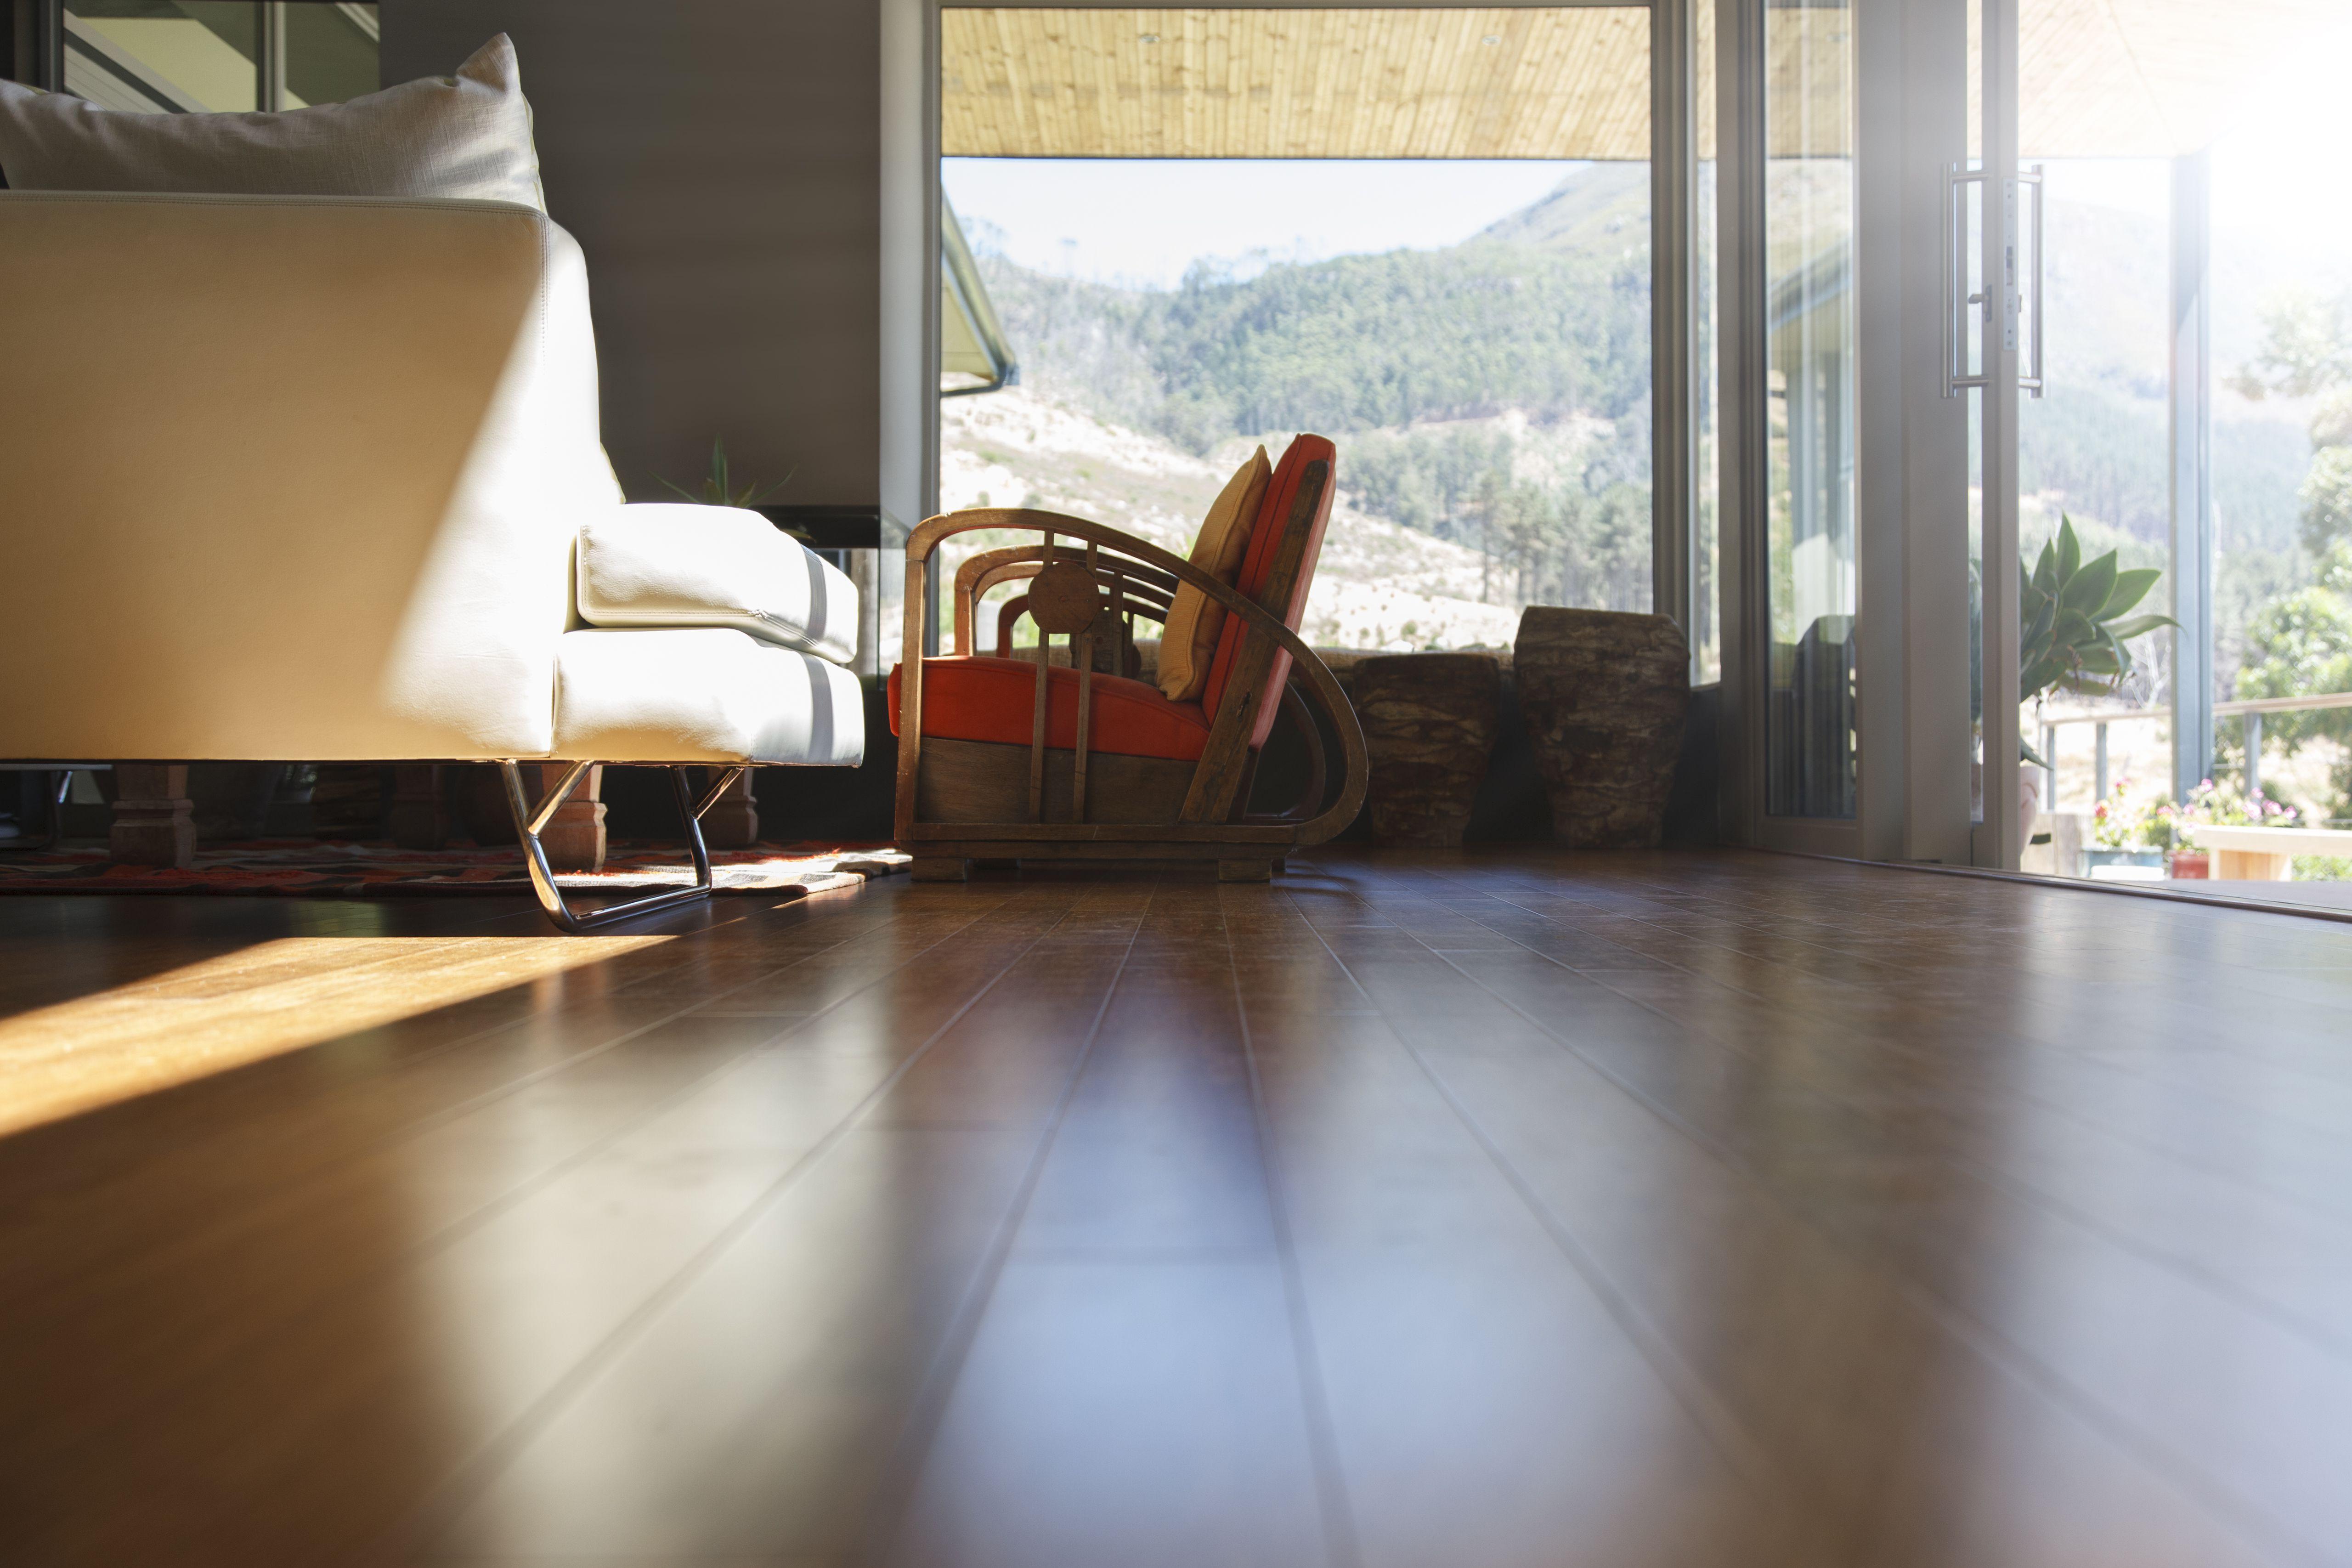 Hand Scraped Engineered Hardwood Flooring Pros and Cons Of Types Of Engineered Flooring From Premium Hardwoods within Living Room Interior Hard Wood Floor and sofa 525439899 5a764f241d64040037603c15